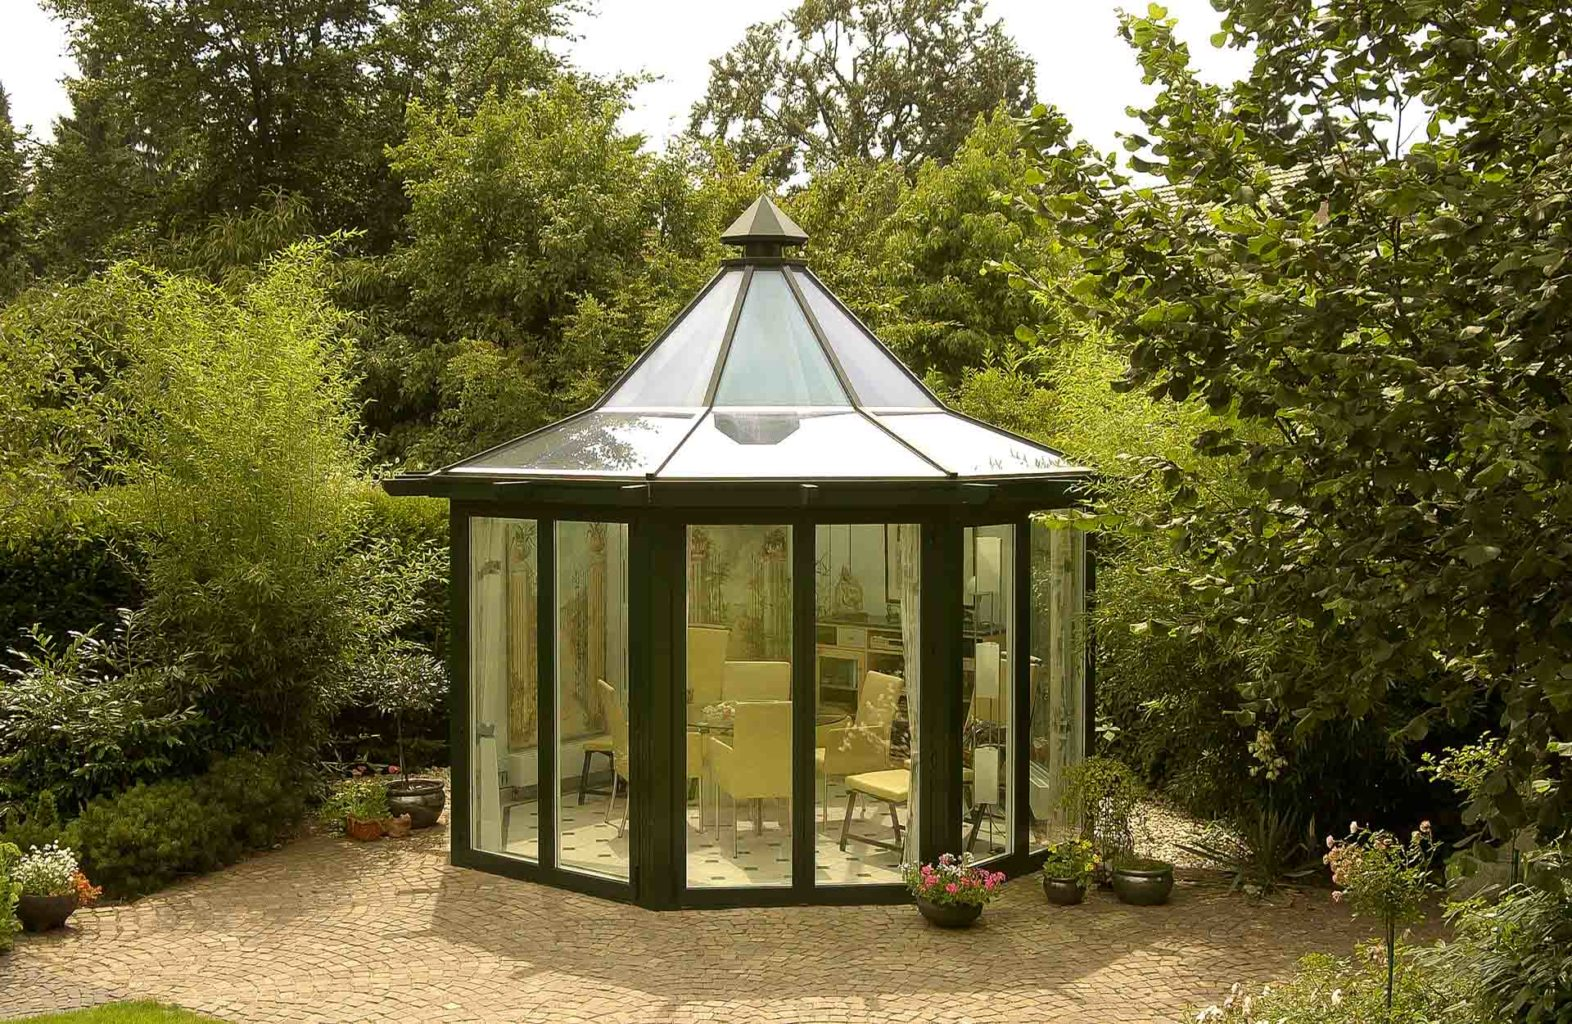 Glas-Pavillon in Bocholt (Objekt 854). Filigranes Pagodendach mit integrierter Beleuchtung. Beheizter, ganzjährig nutzbarer Glas-Gartenpavillon